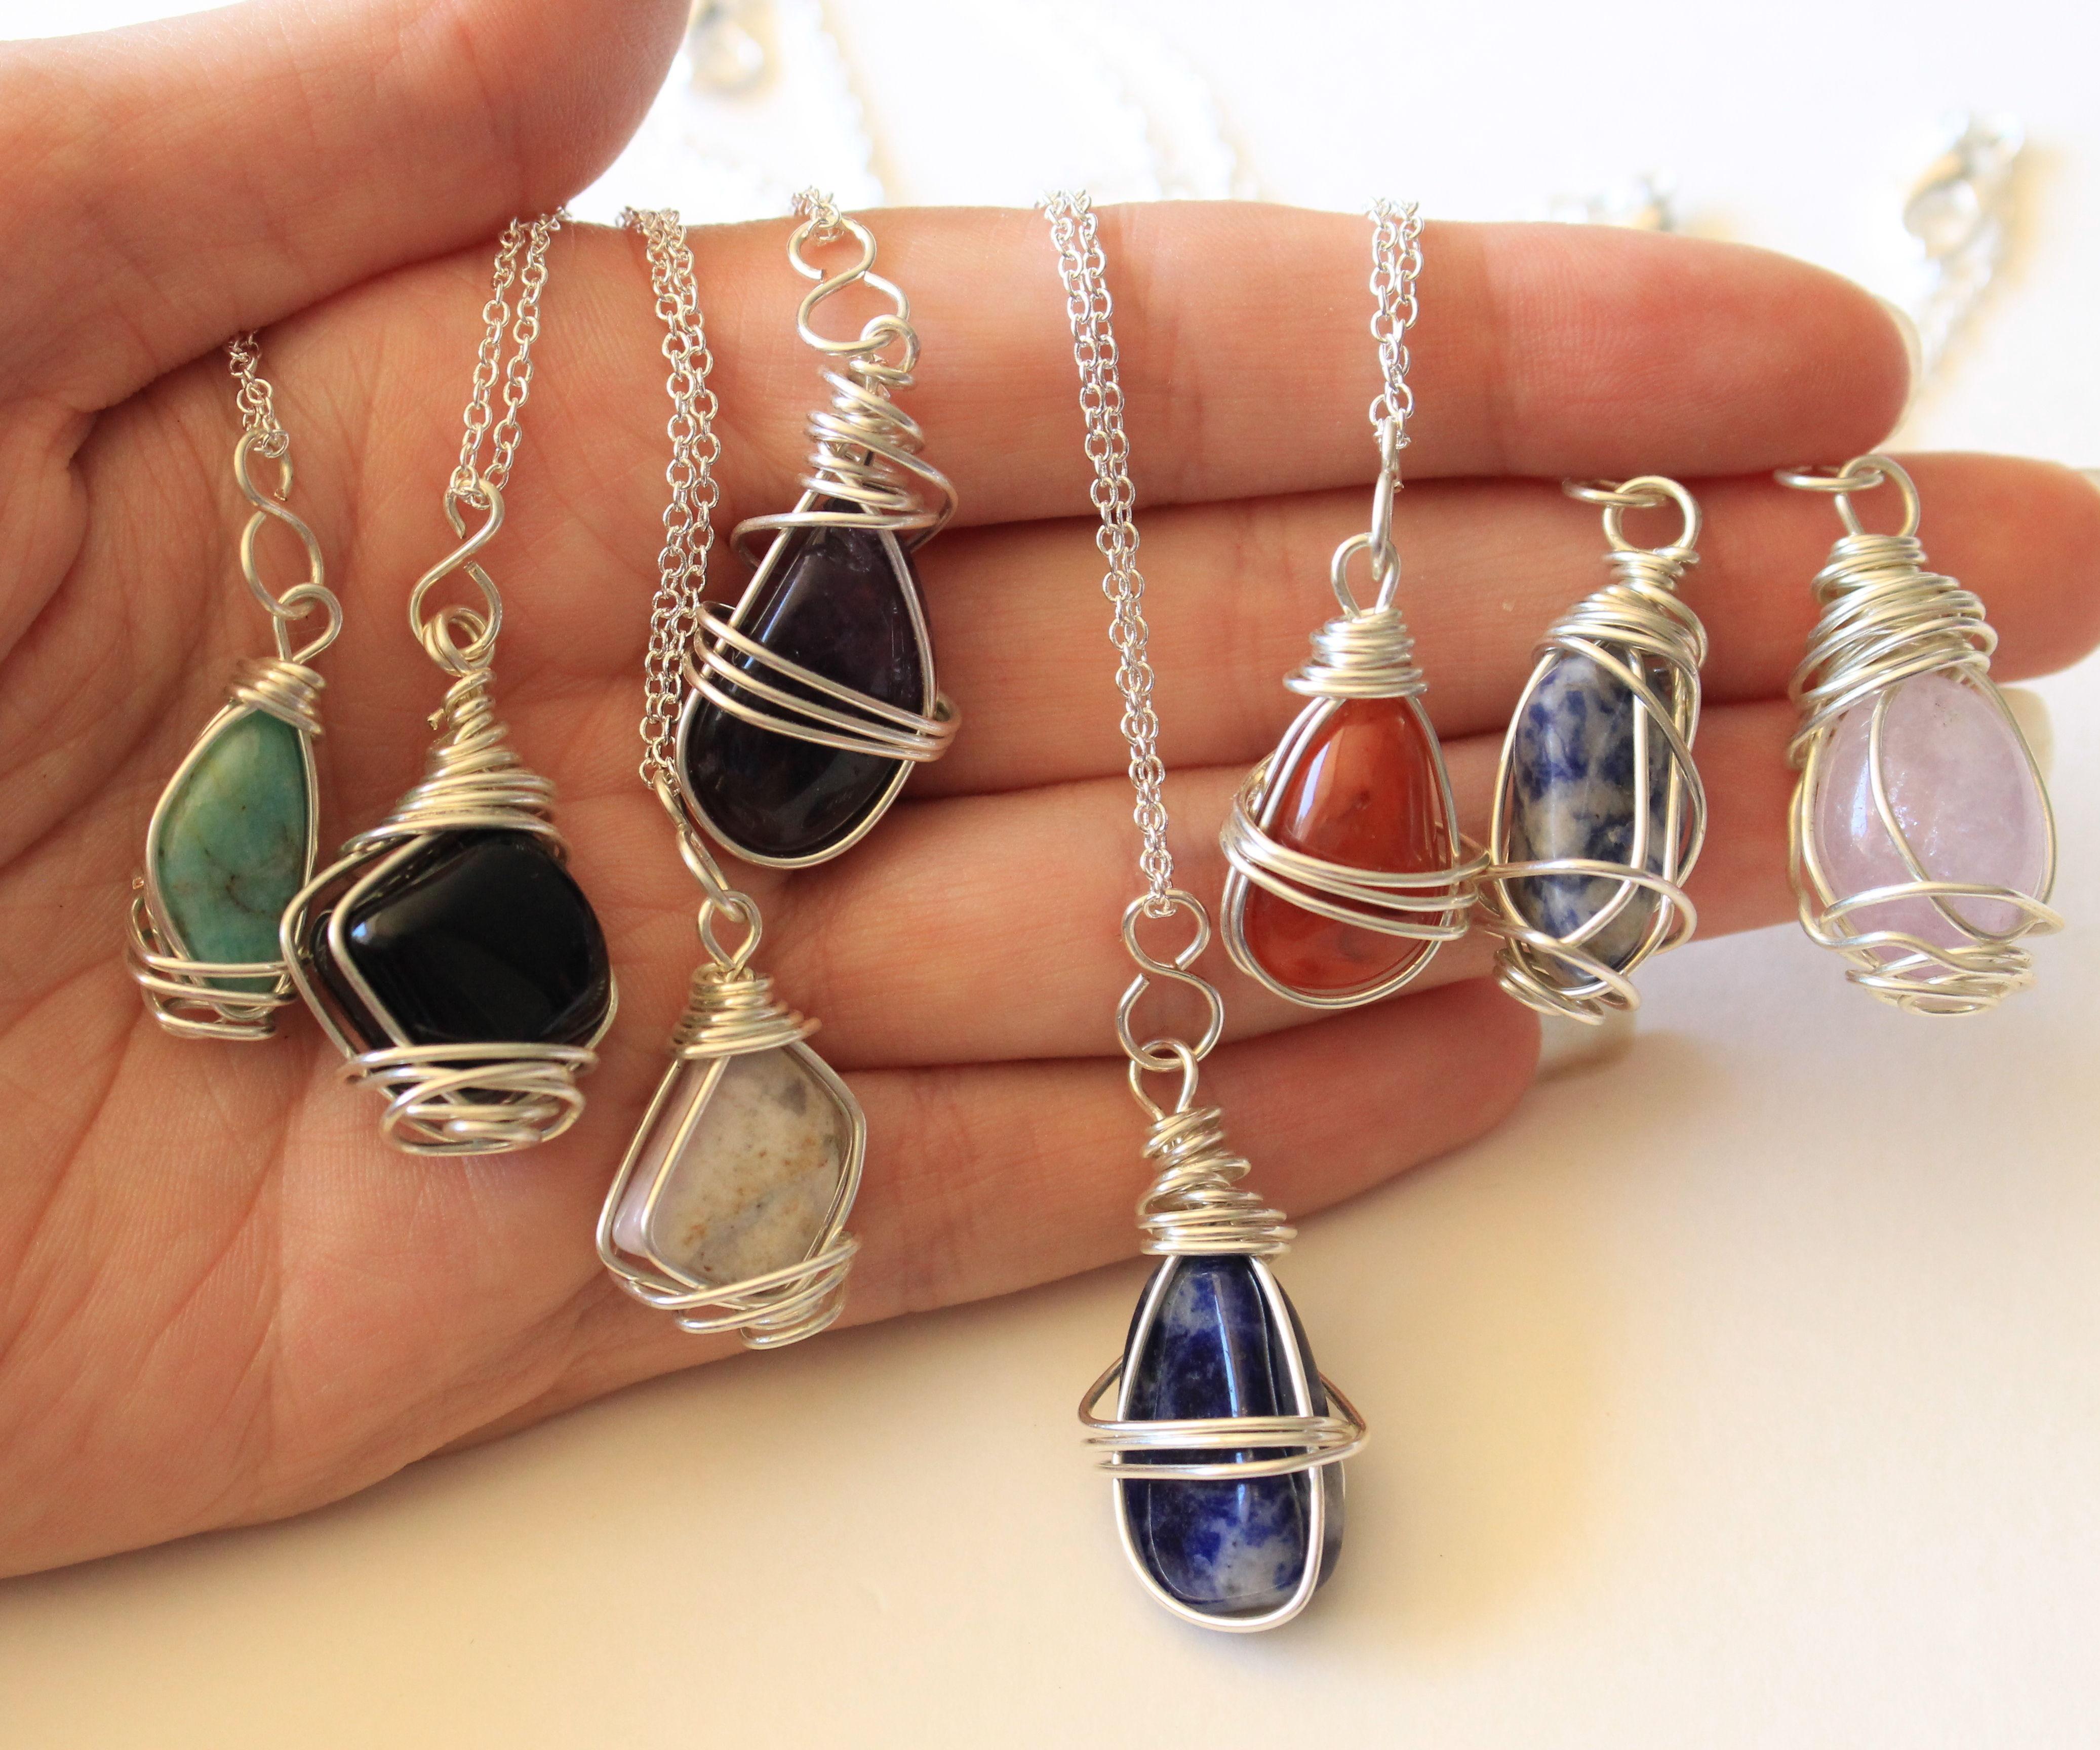 Wire Wrapped Stone Pendants II